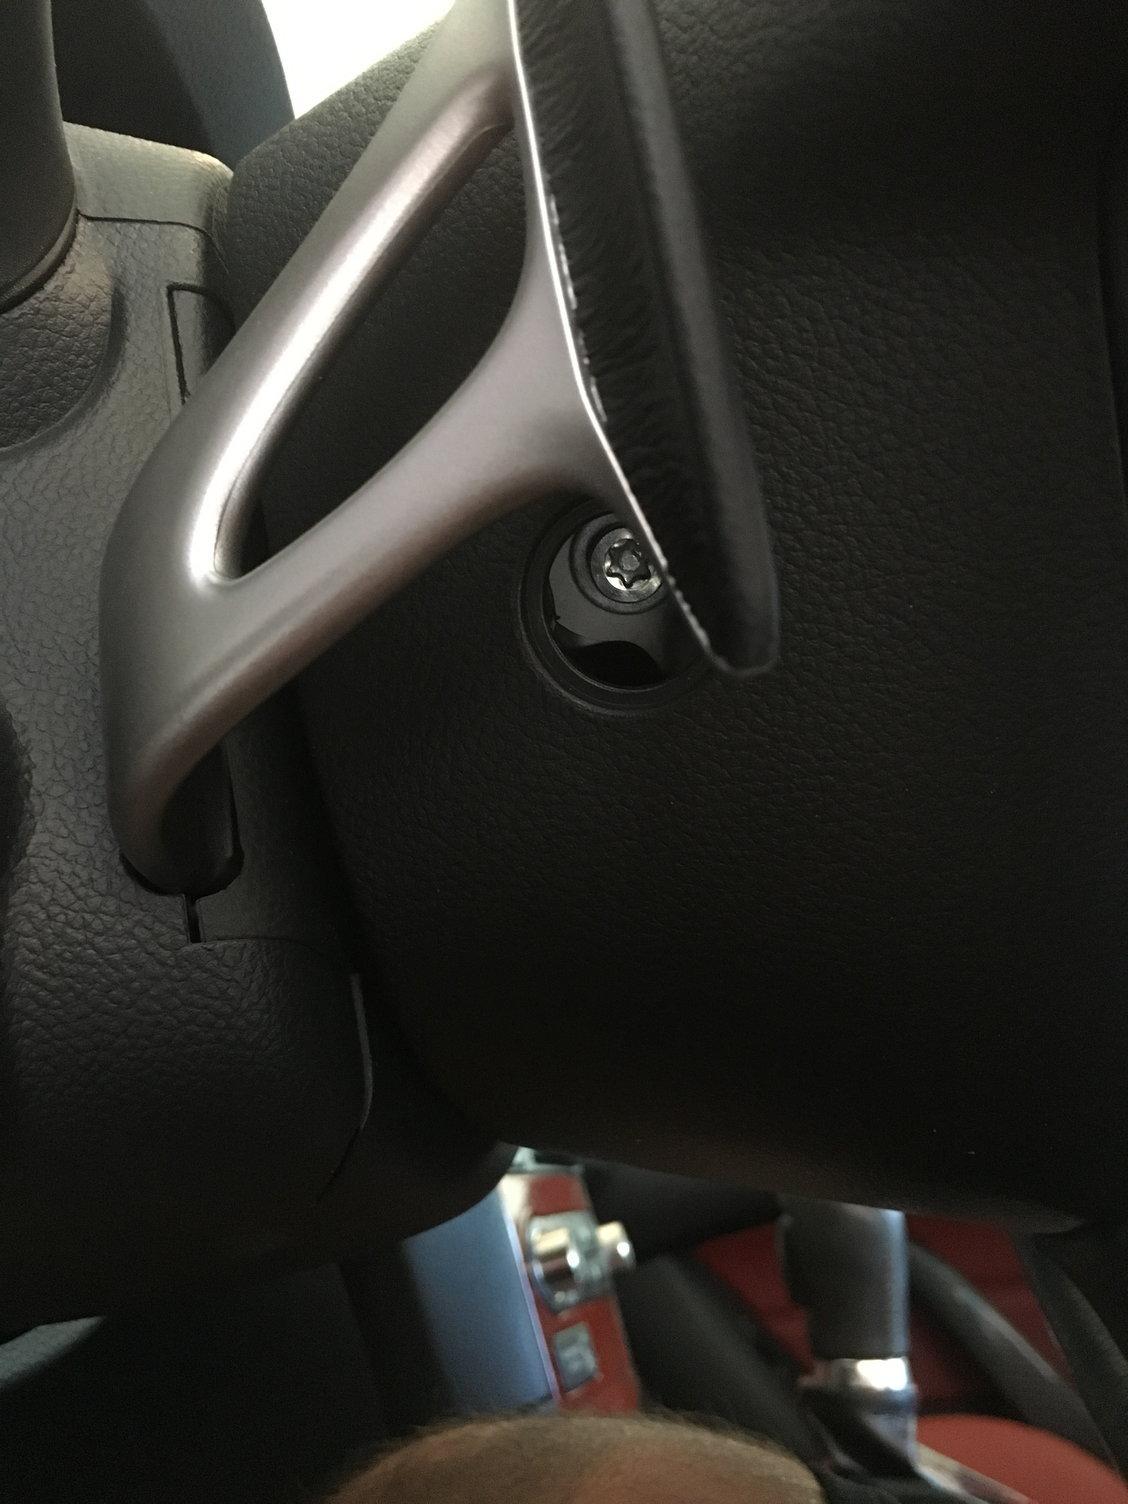 DIY Aftermarket Steering Wheel & Hub Install - MyG37